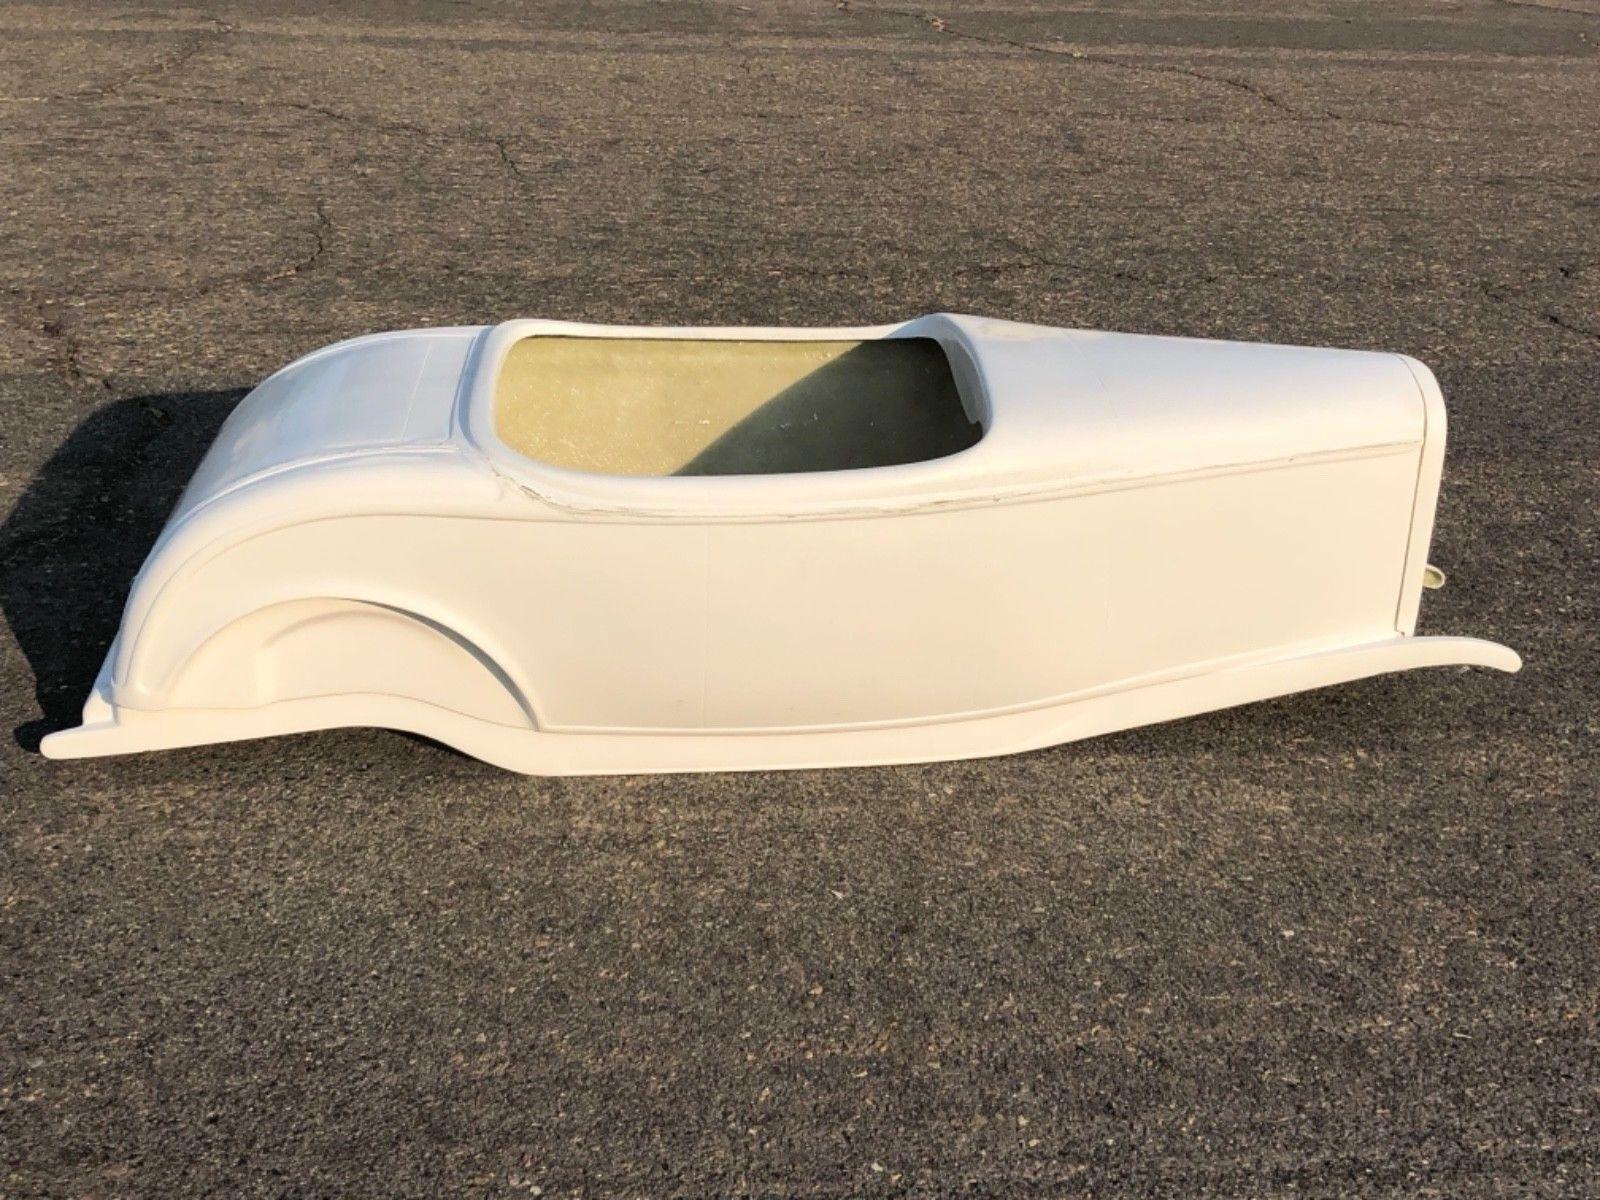 Pedal Car Stroller Fiberglass Body